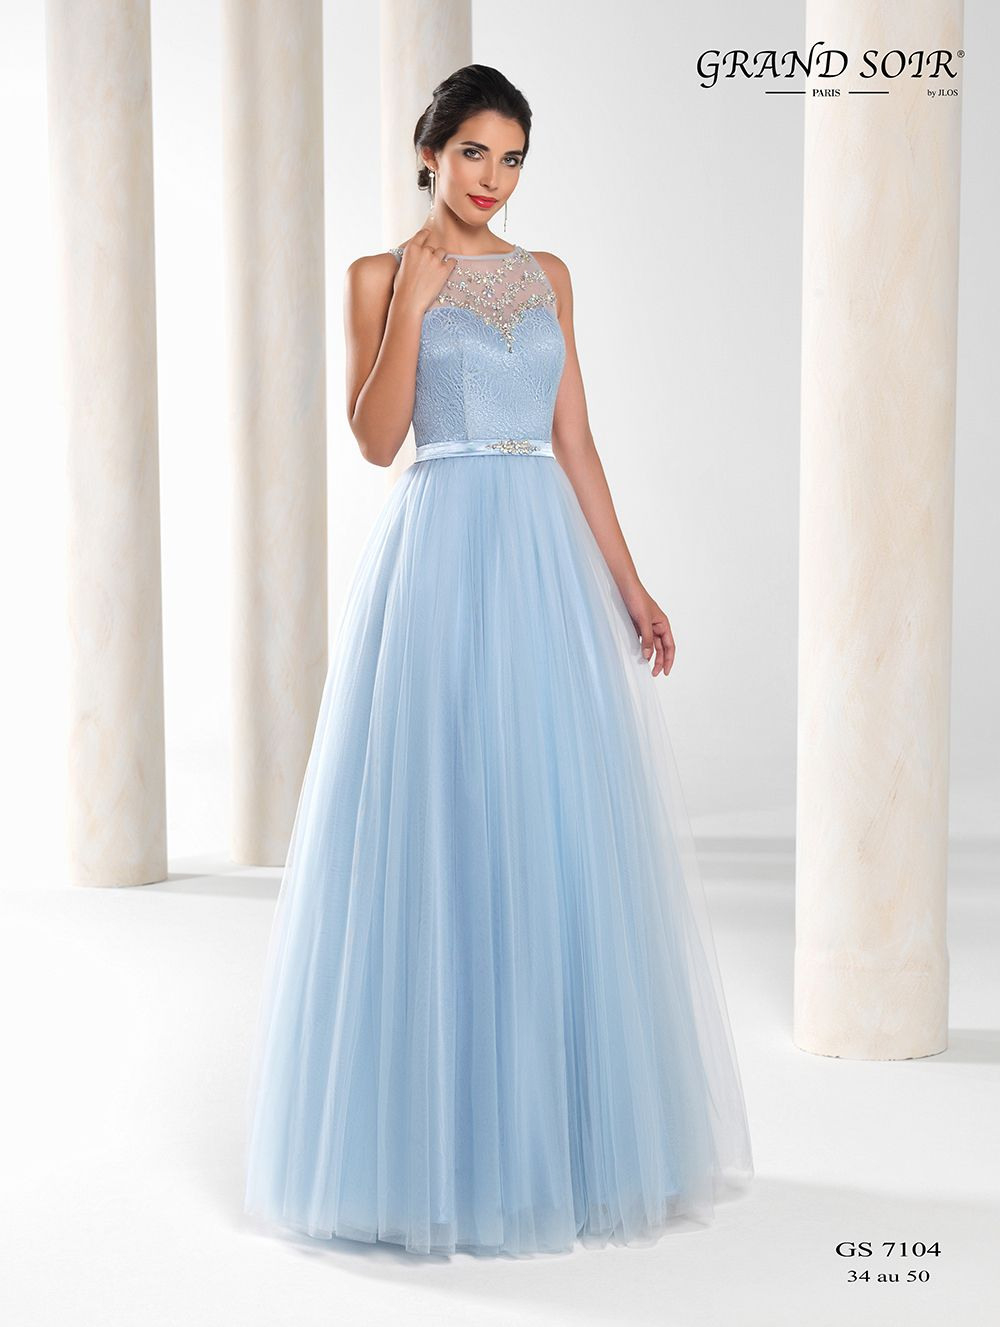 Designer Genial Abendkleid Hellblau Bester PreisFormal Schön Abendkleid Hellblau Boutique